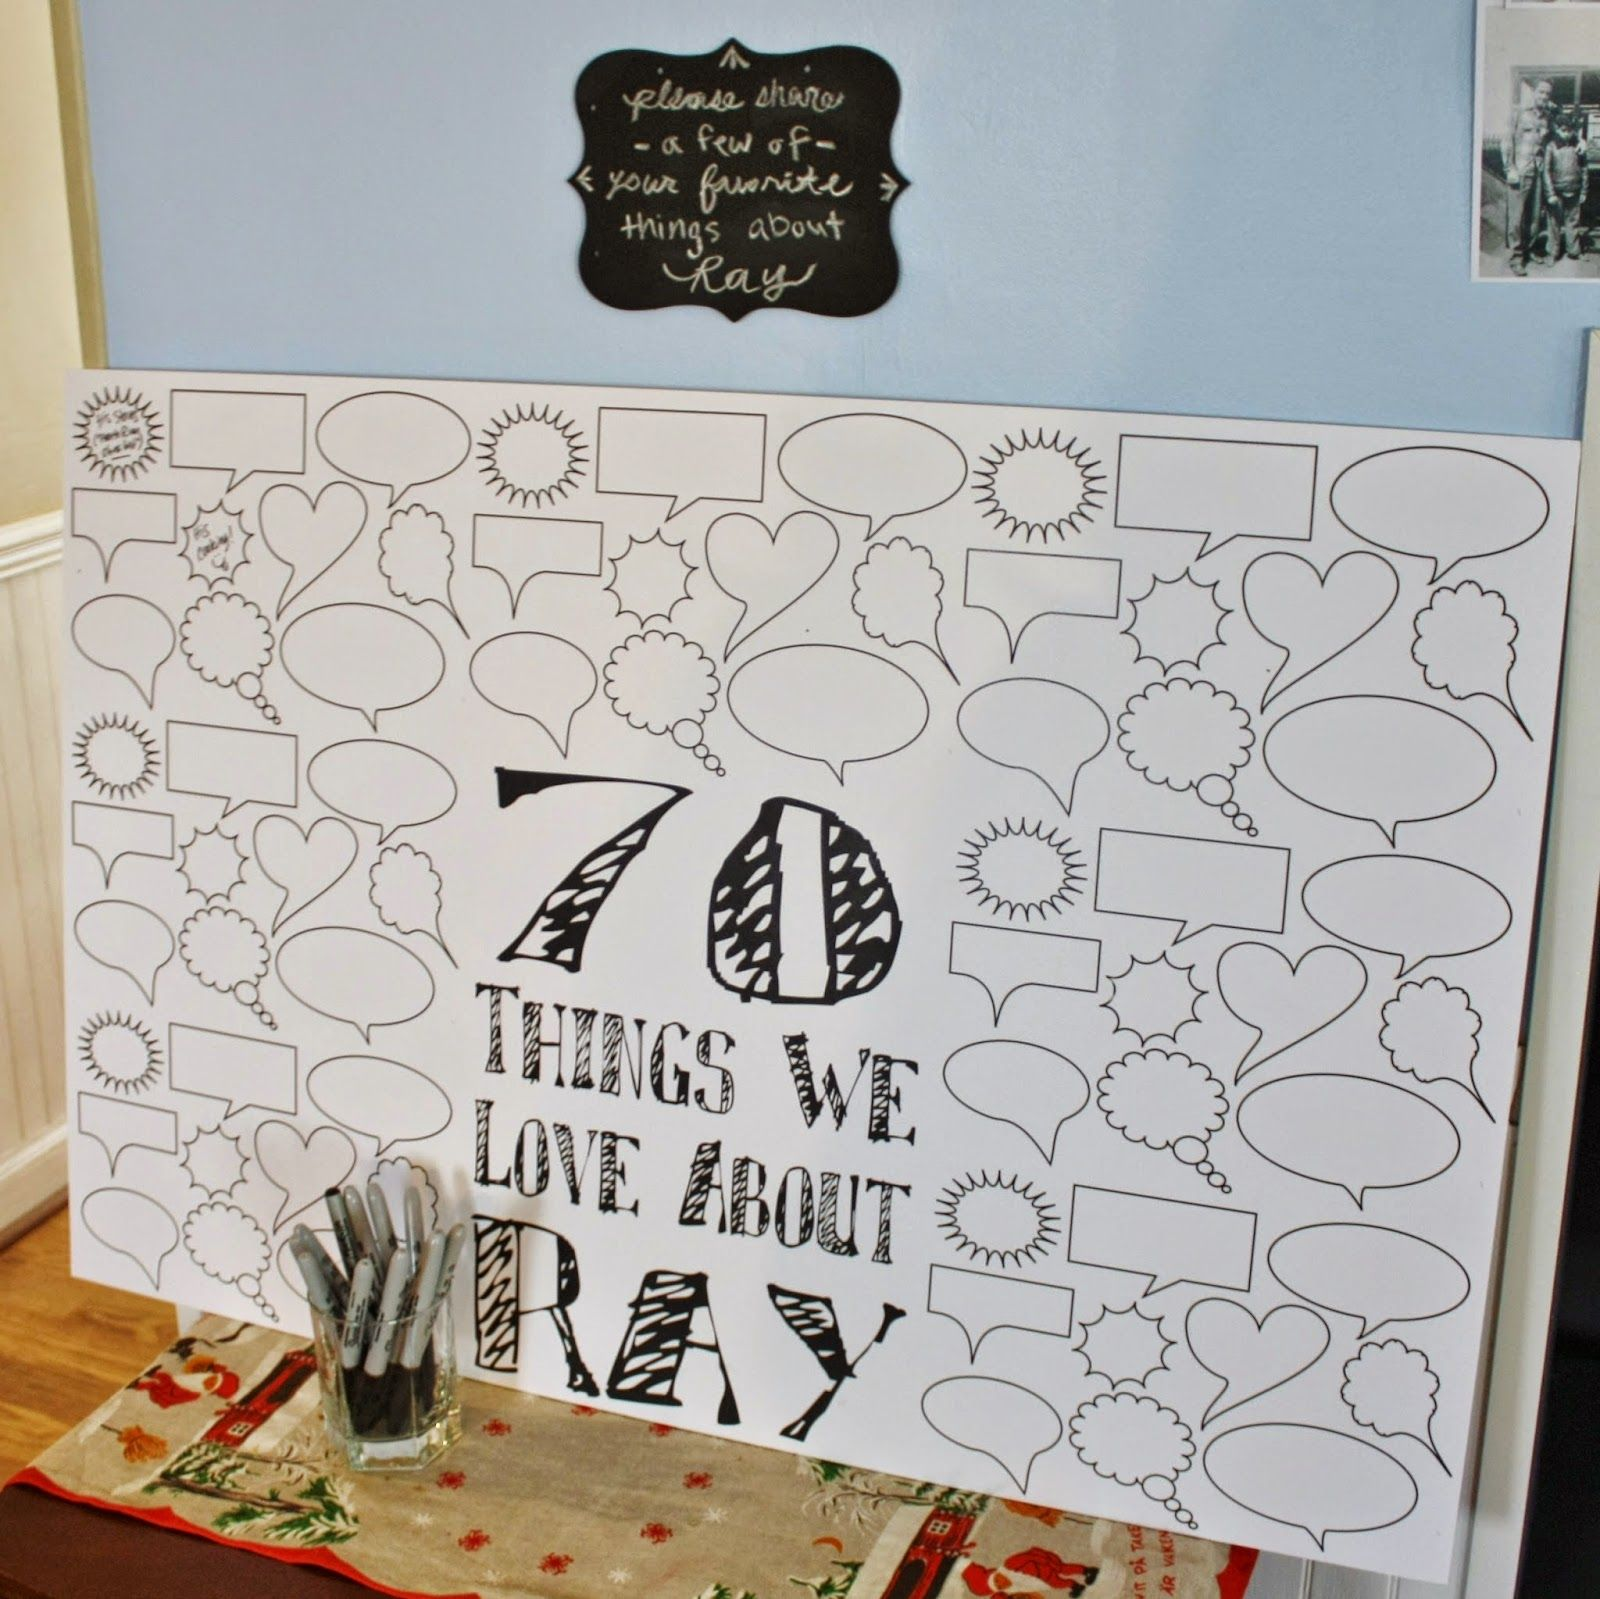 milestone birthday: planning my dad's 70th birthday party | 70